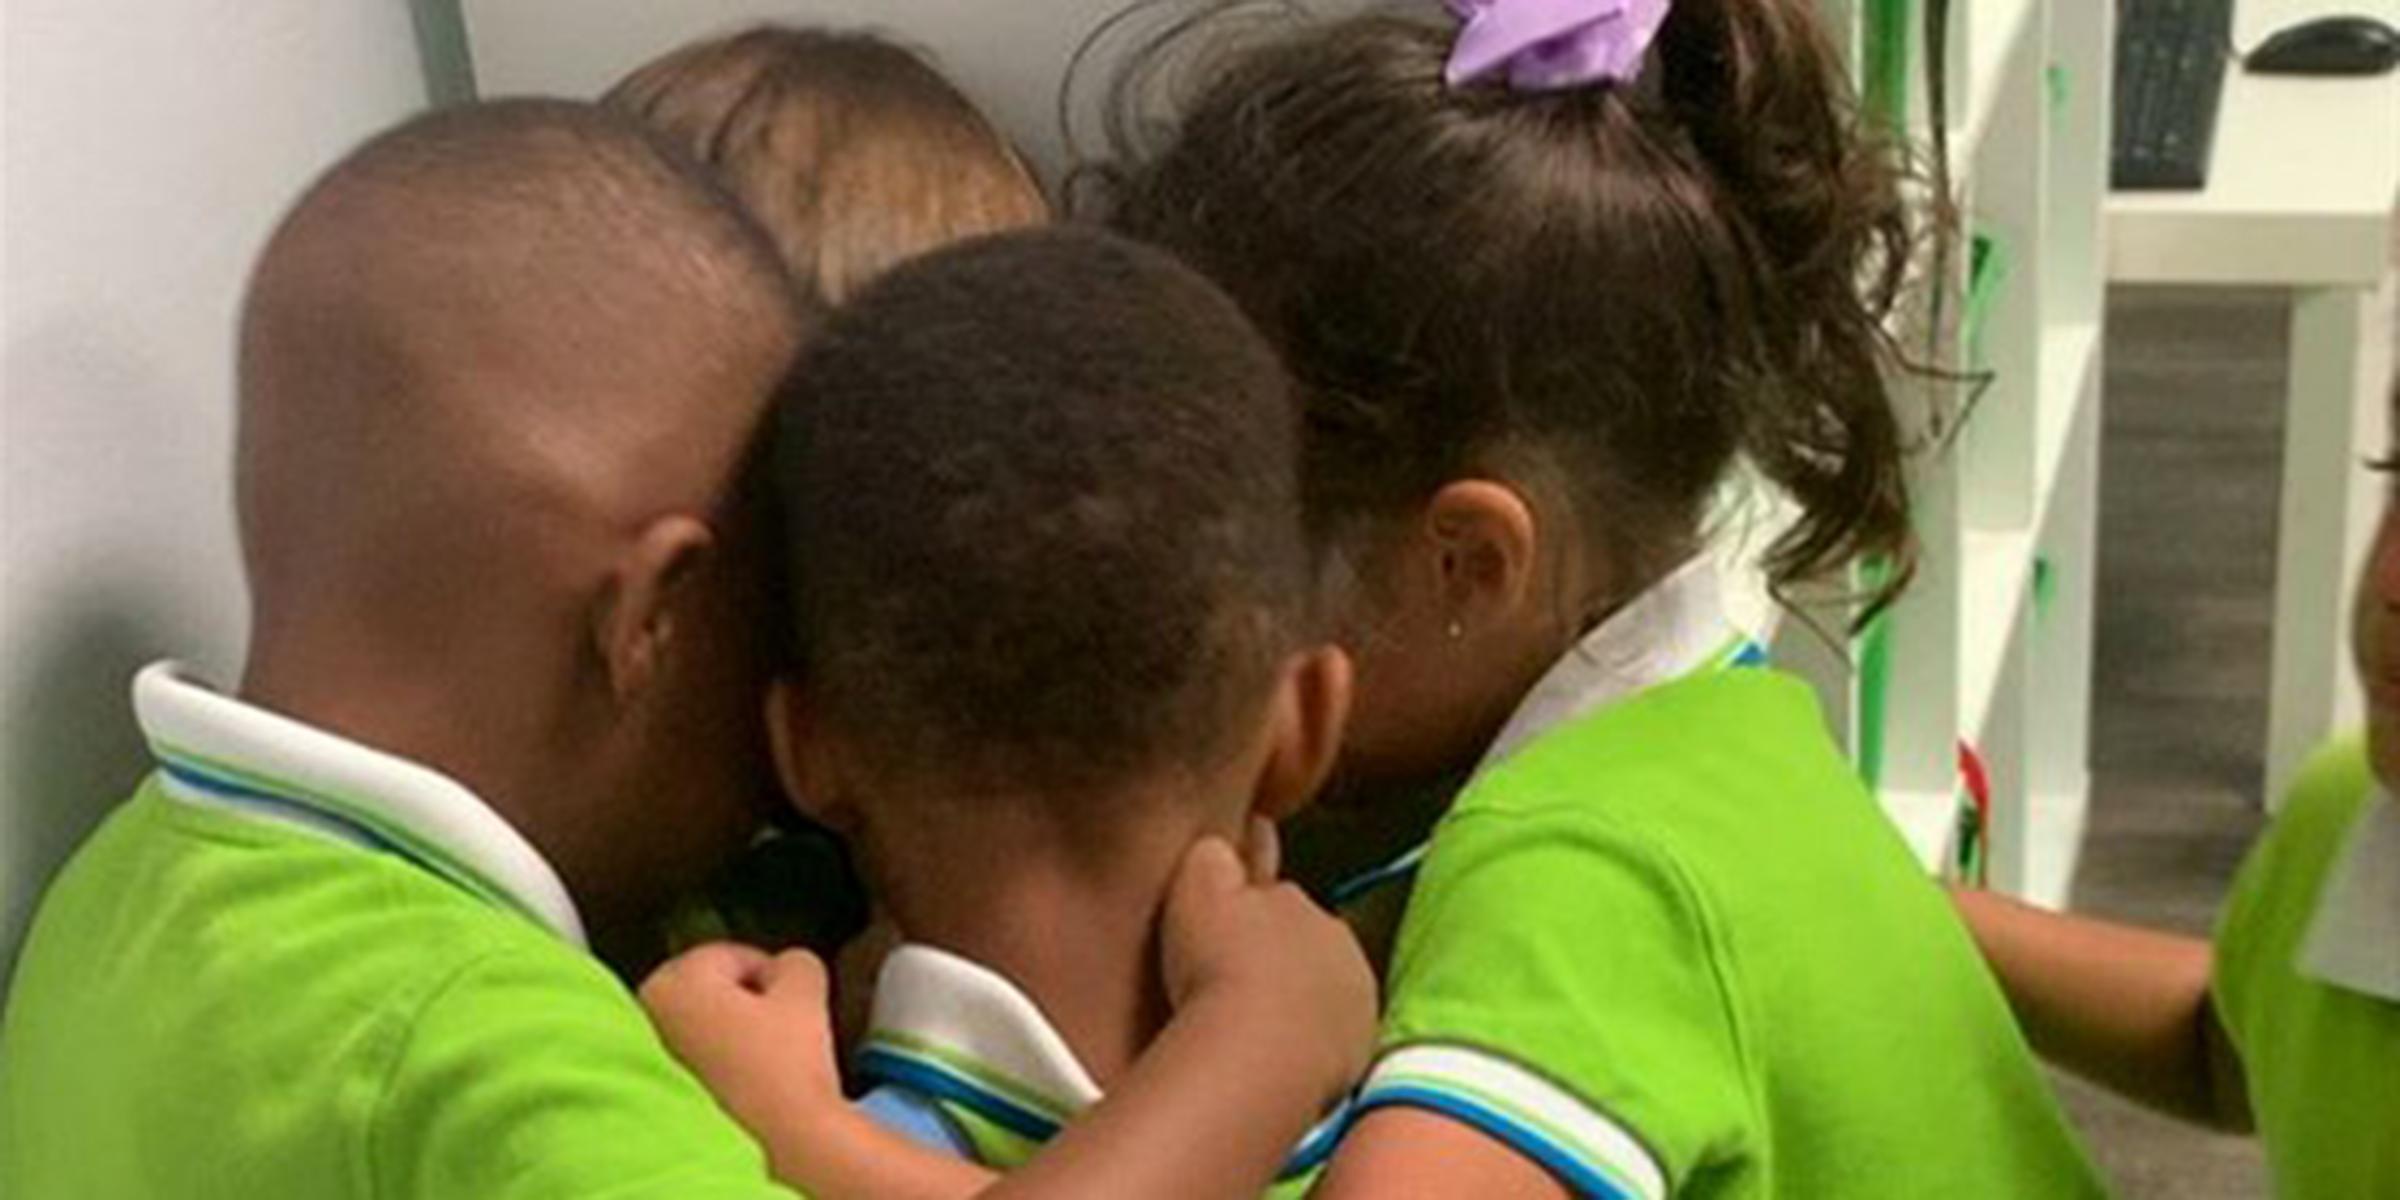 Hurricane Dorian survivor gets warm welcome from classmates